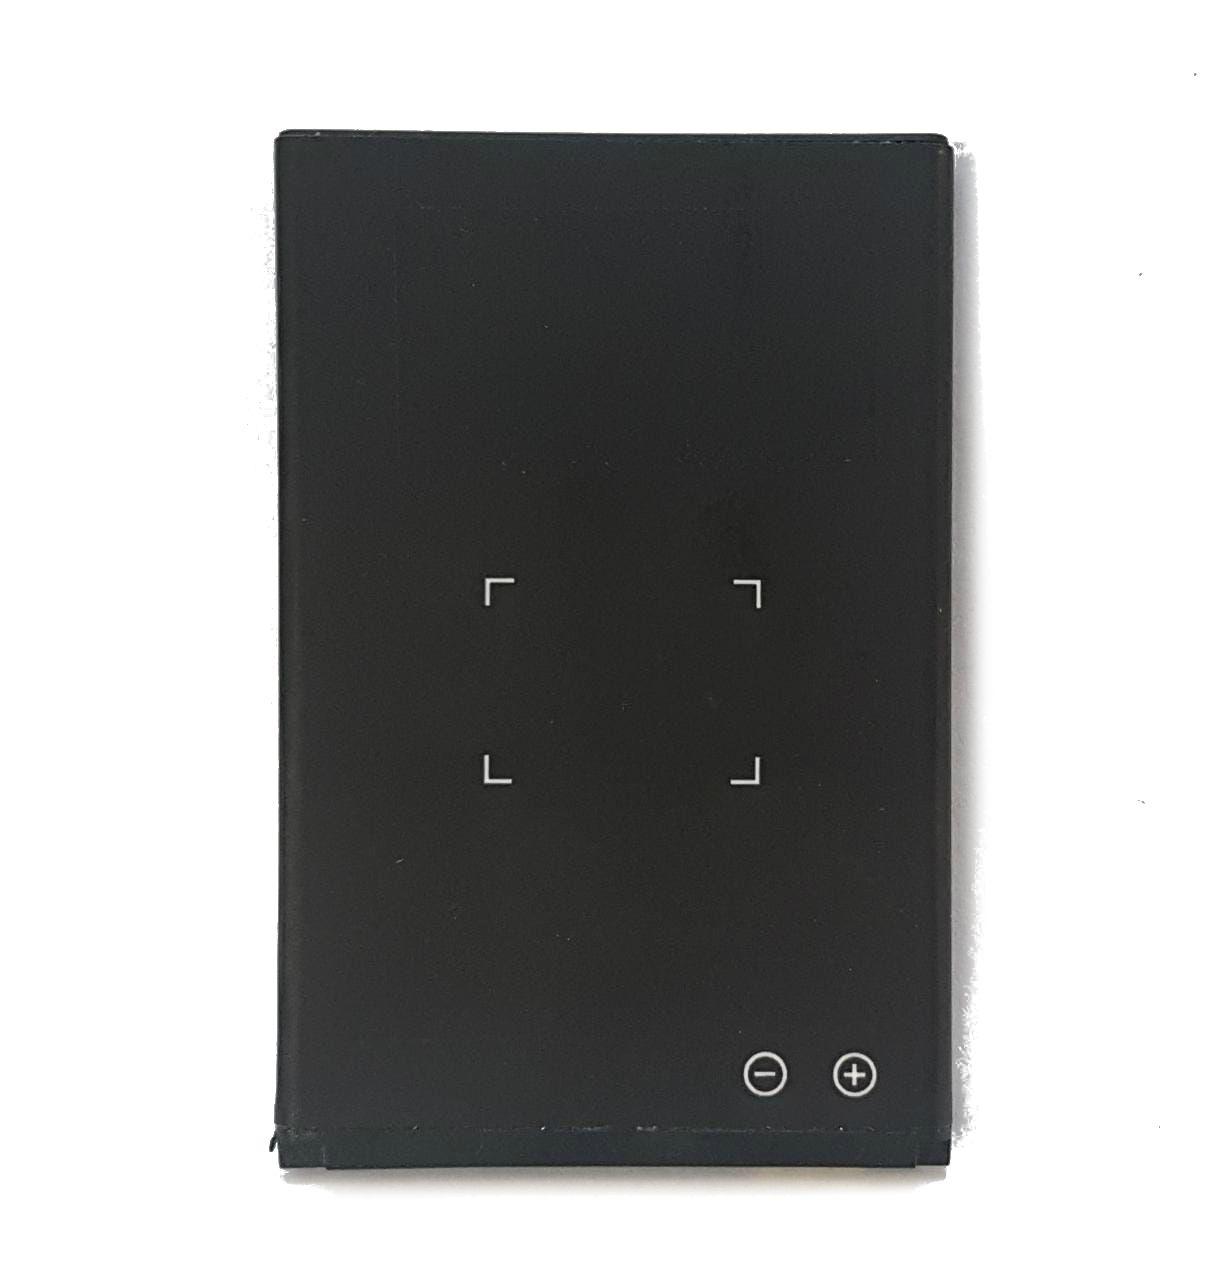 Bateria Positivo Ypy S460 Bt-s460